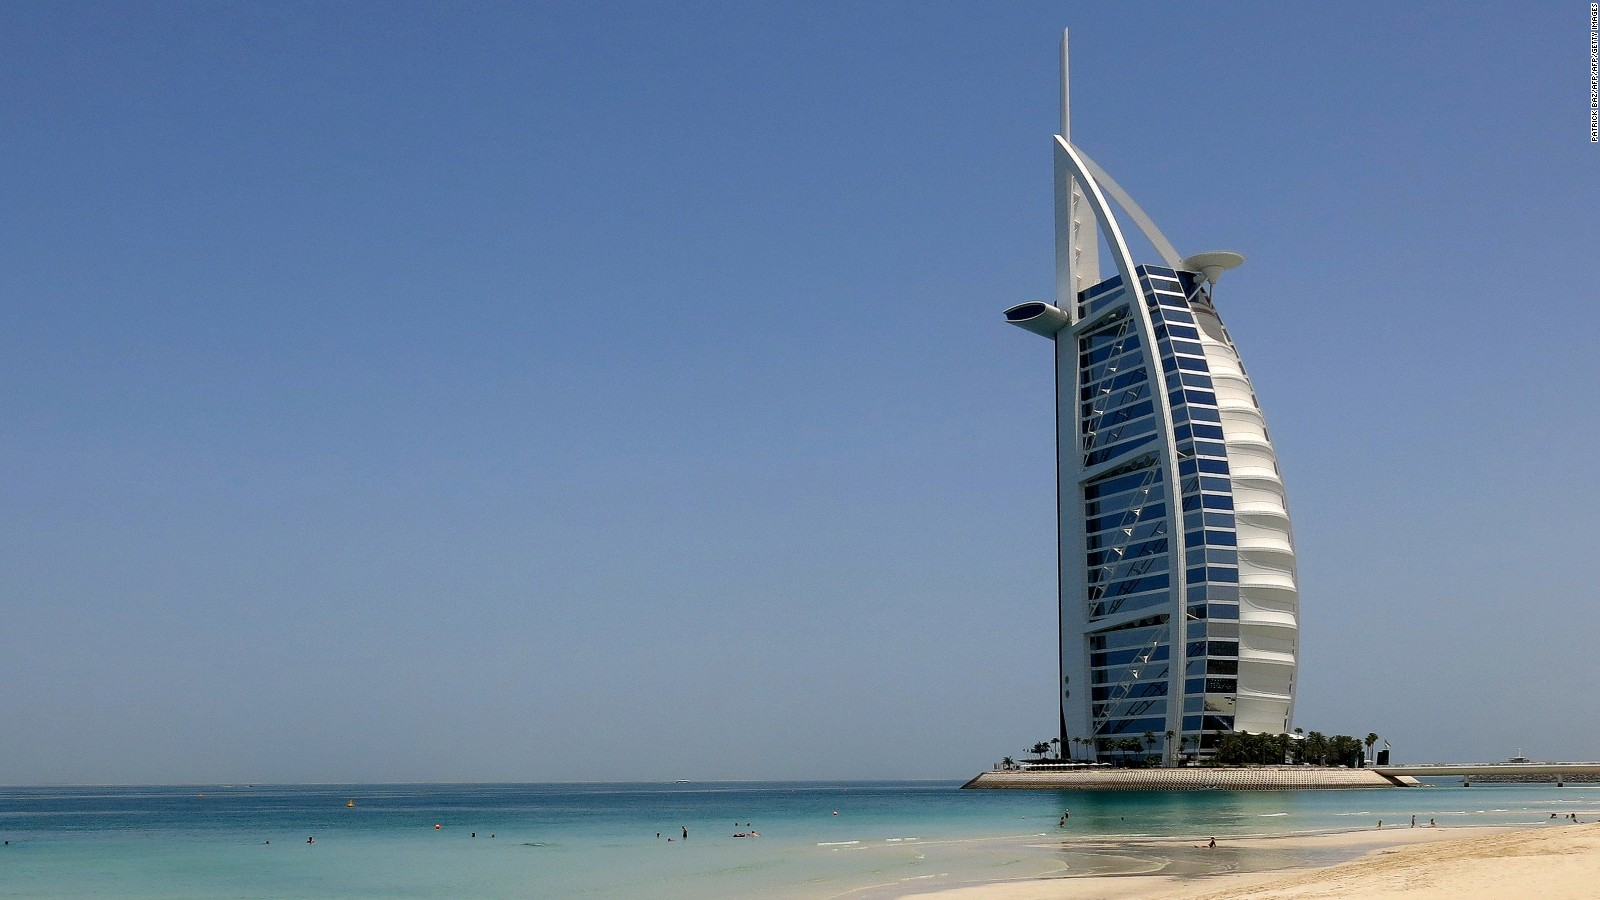 marsa al arab: dubai building new $1.7 billion islands | cnn travel